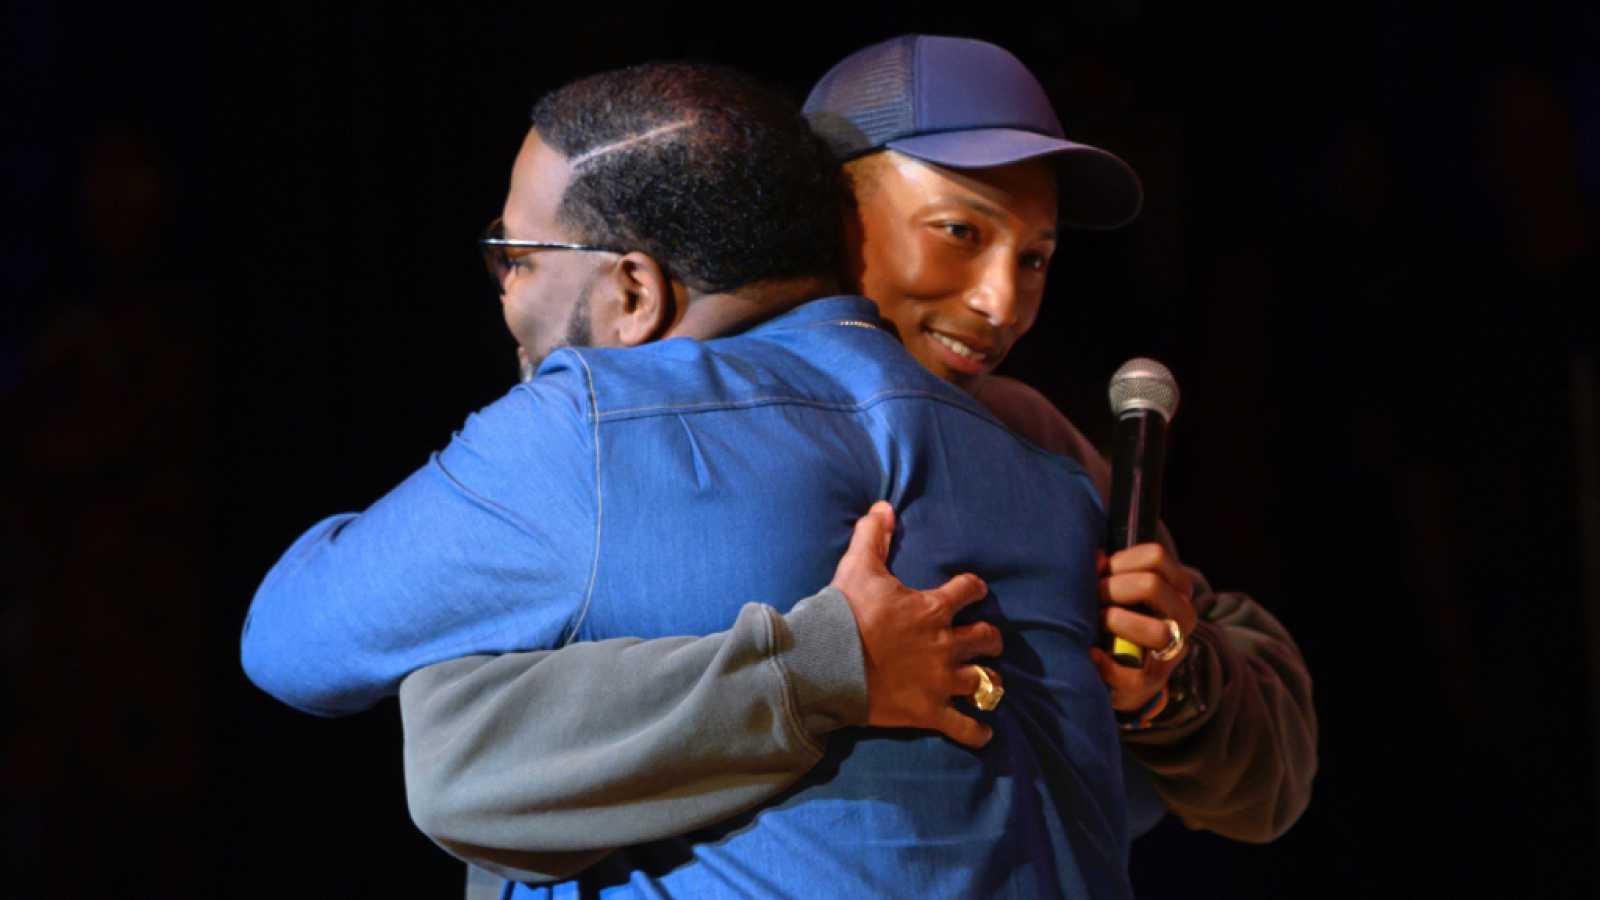 Pharrel Williams prepara 'Voices of fire', una docuserie sobre góspel